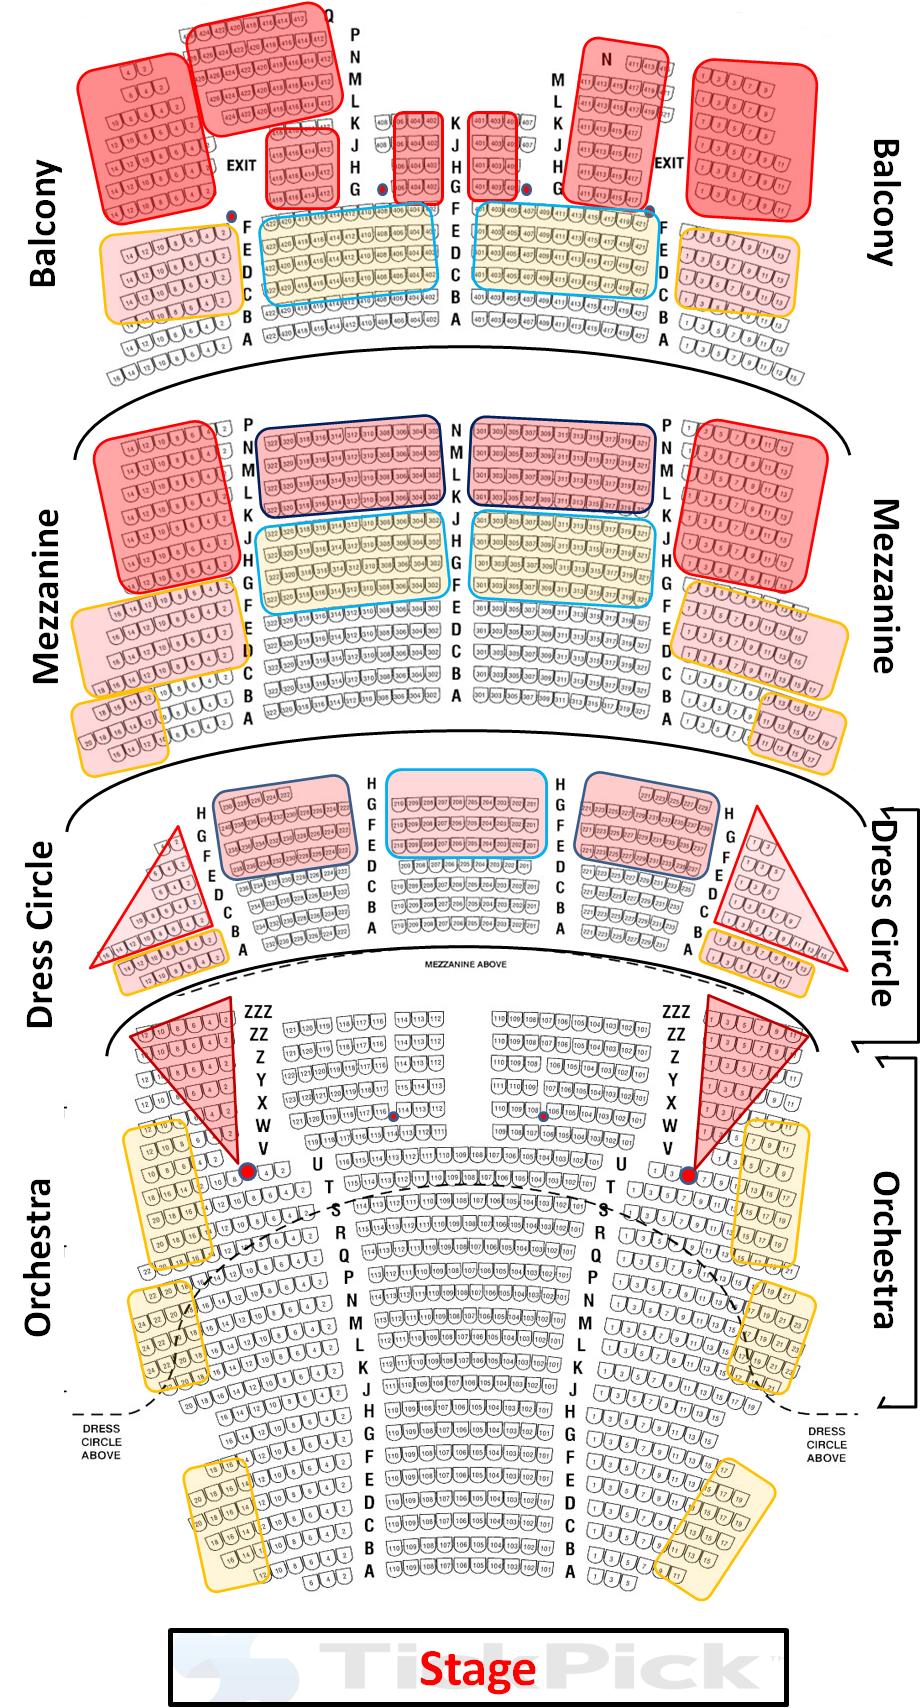 Mampt Bank Seating Chart